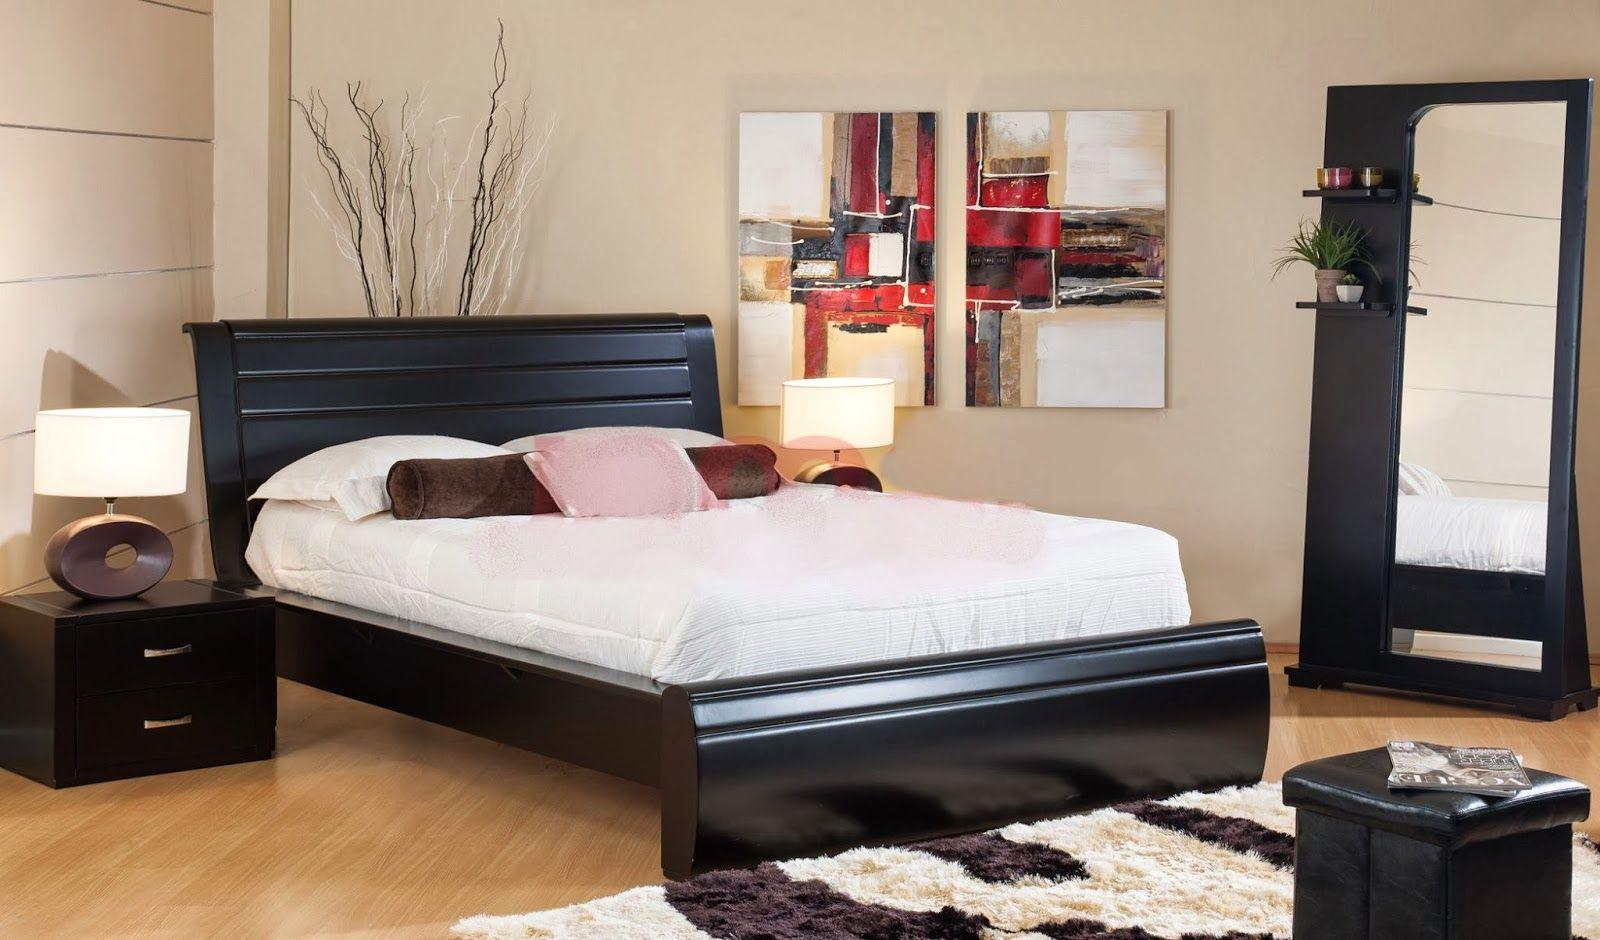 Pin de maripili fereira de navarro en cosas de madera madera for Ejemplo de dormitorio deco